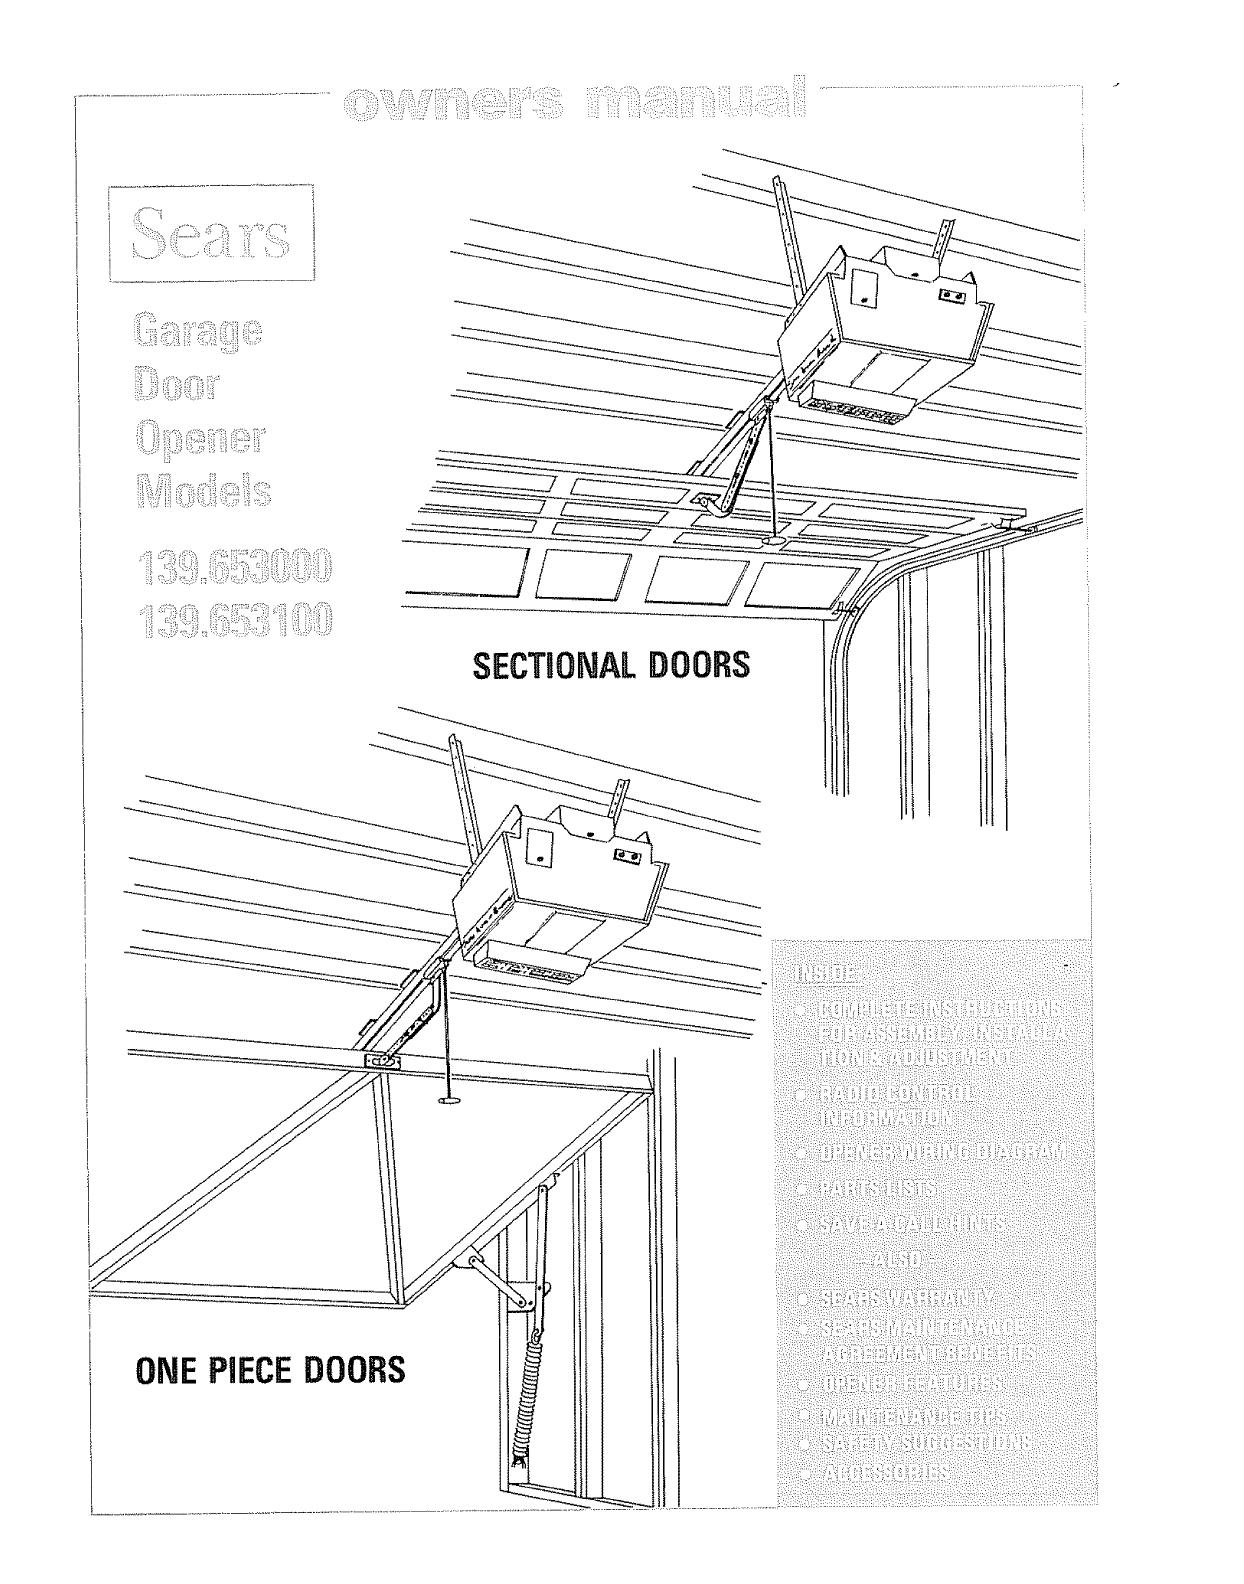 Craftsman 139653000 User Manual Sears Electronic Garage Door Opener